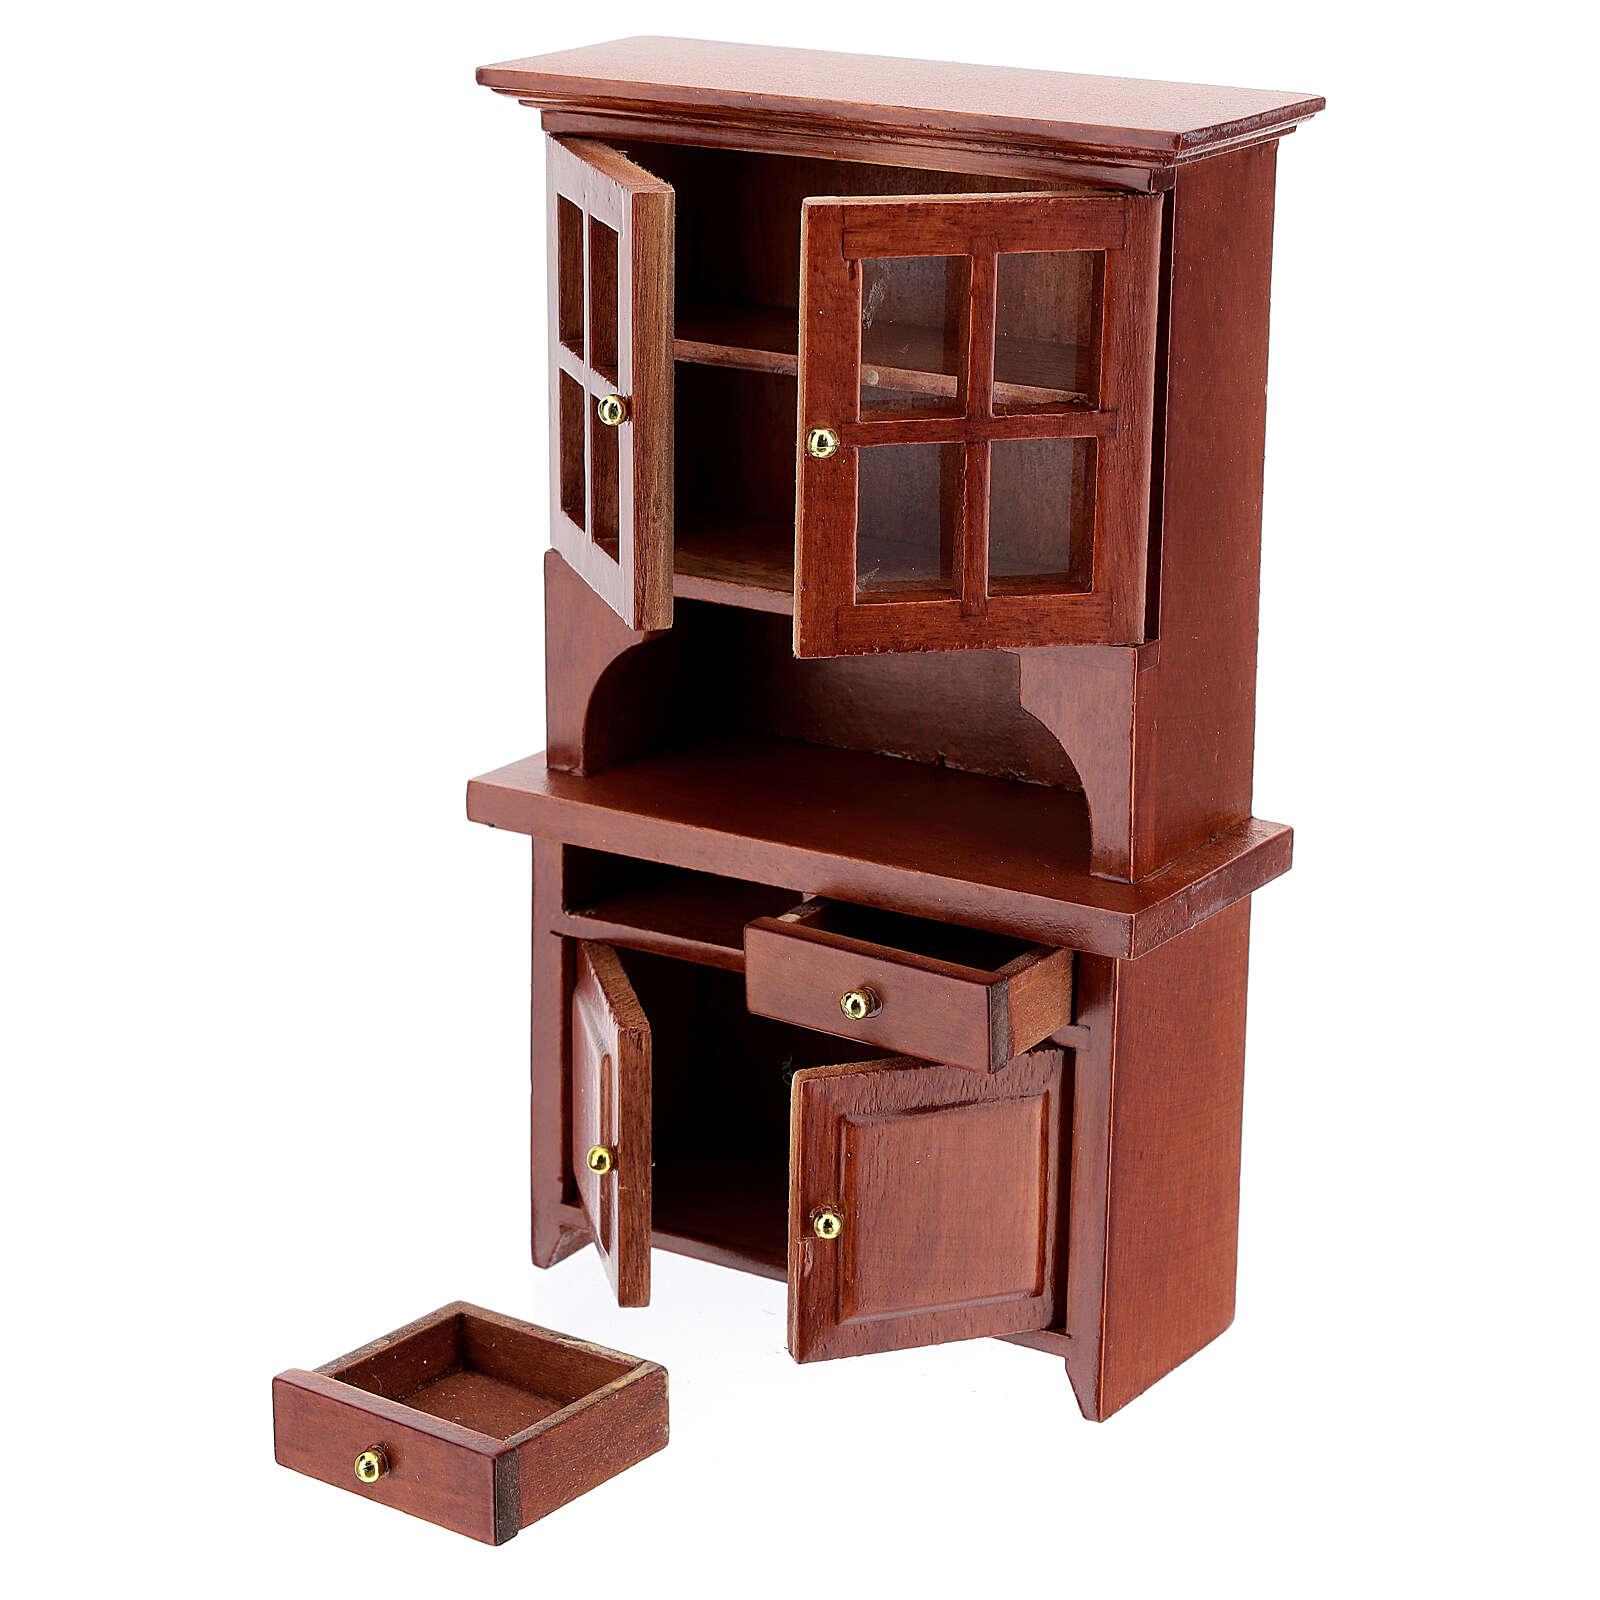 Wooden furniture set 7 pieces Nativity scene 12 cm 4